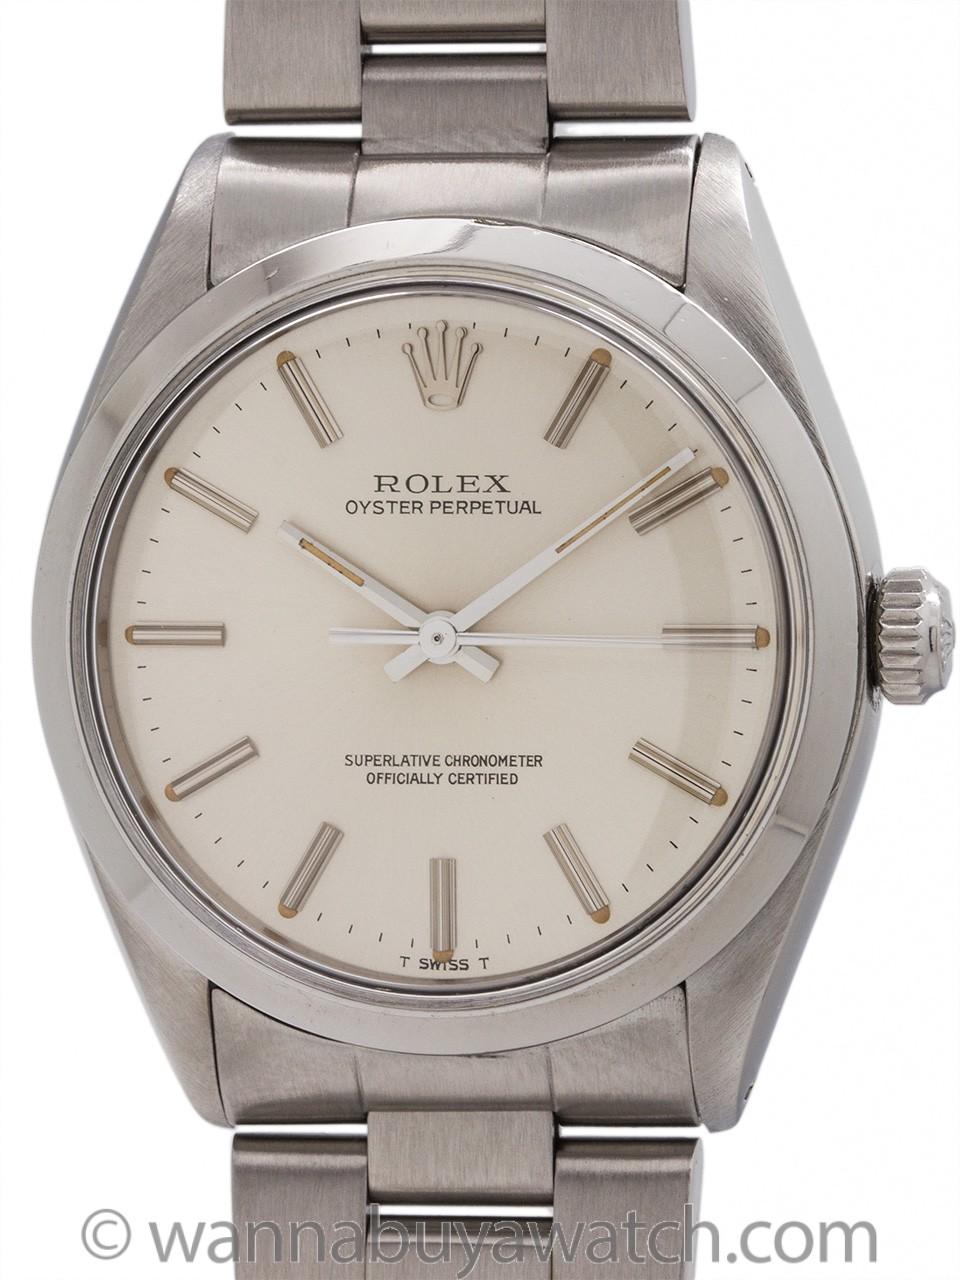 Rolex Oyster Perpetual ref 1002 Chronometer circa 1980